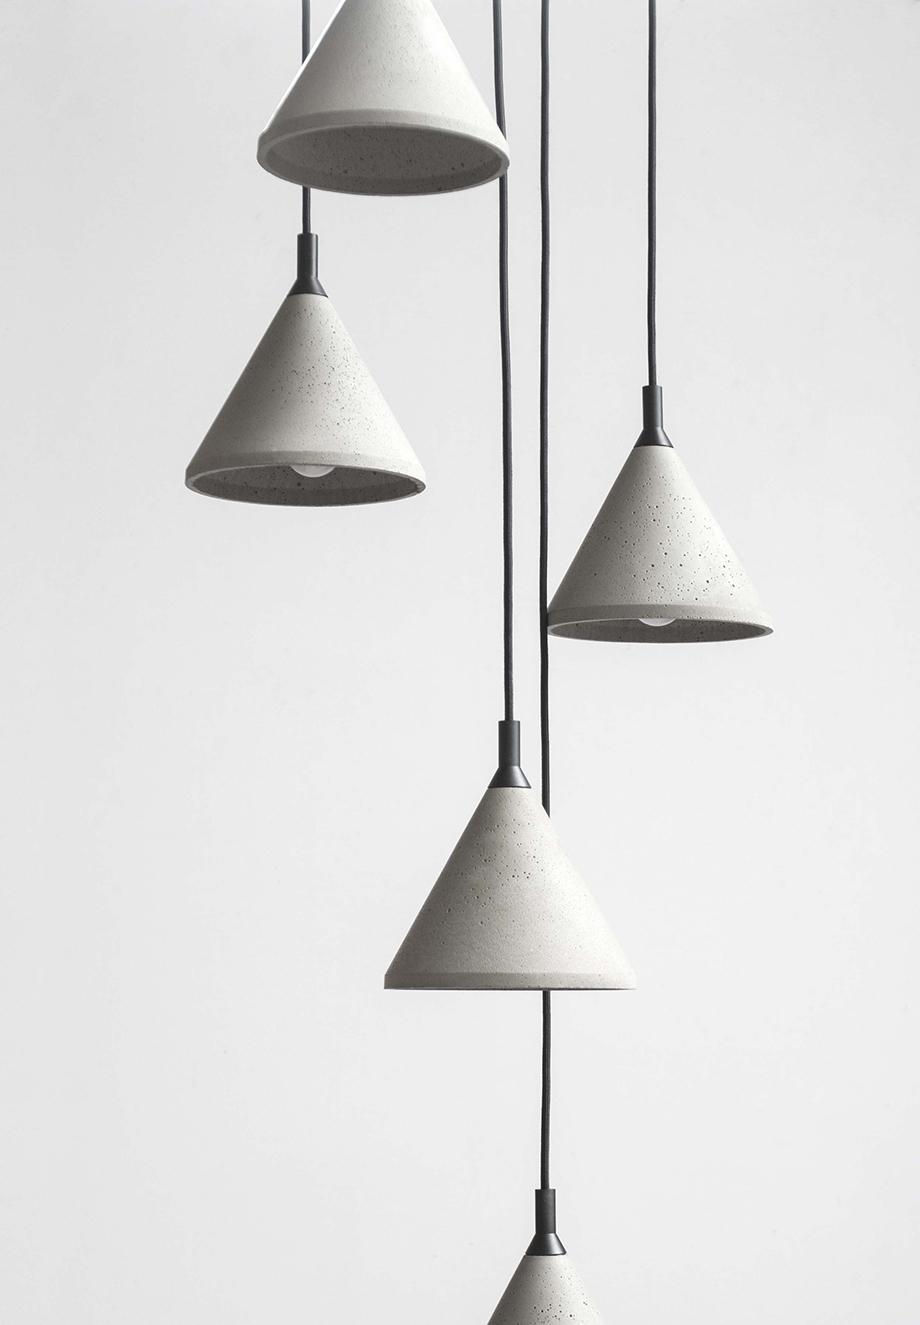 Bentu-Zhong-Contemporary-Furniture-Savannah-Bay-Gallery